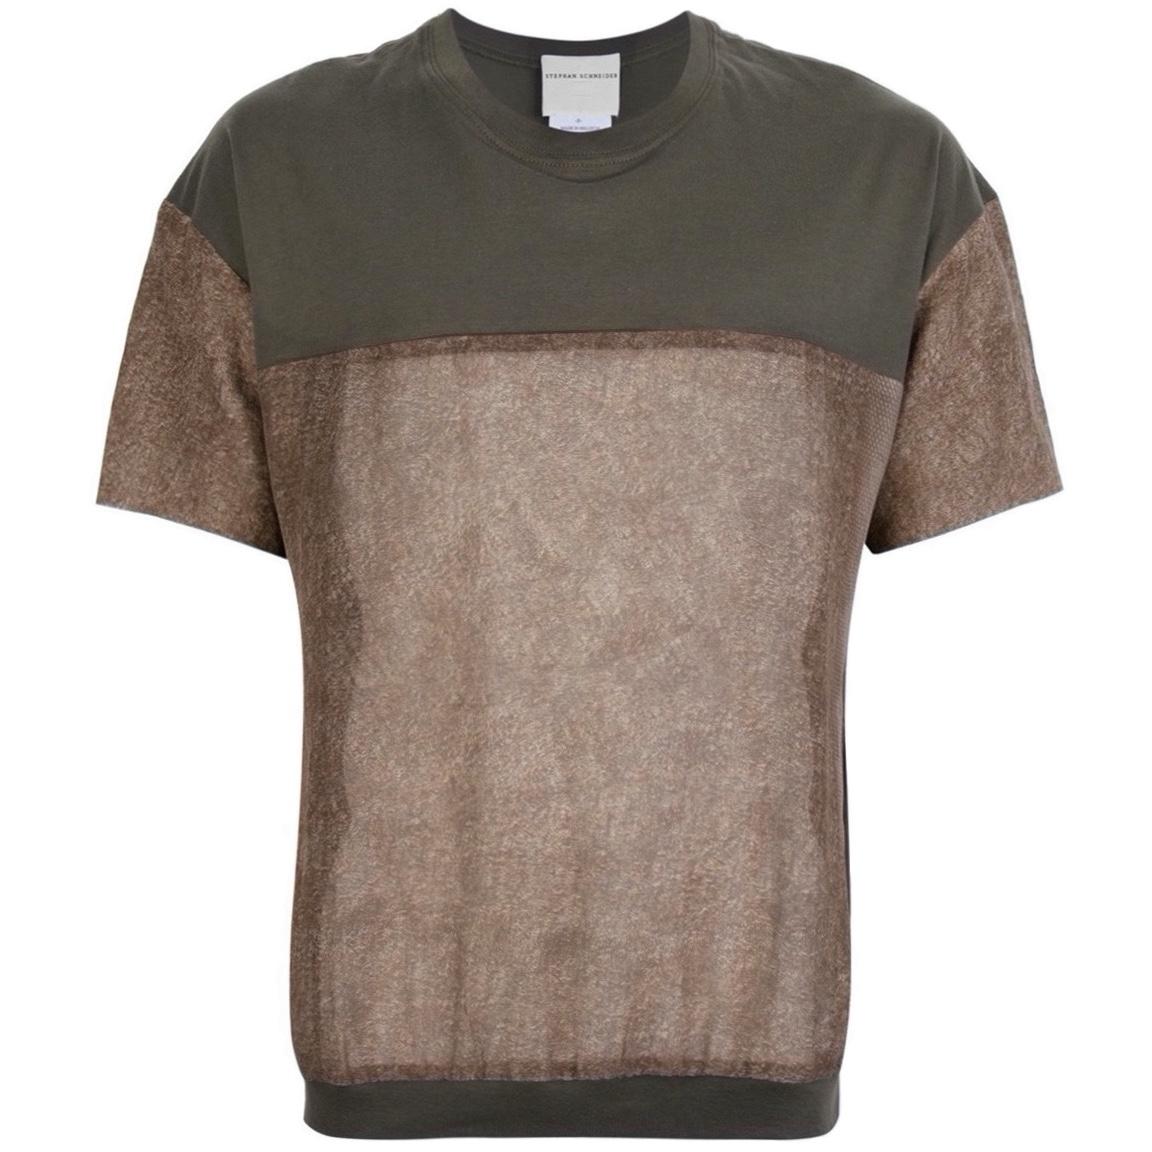 stephan scheinder silk panel t shirt copy.jpg